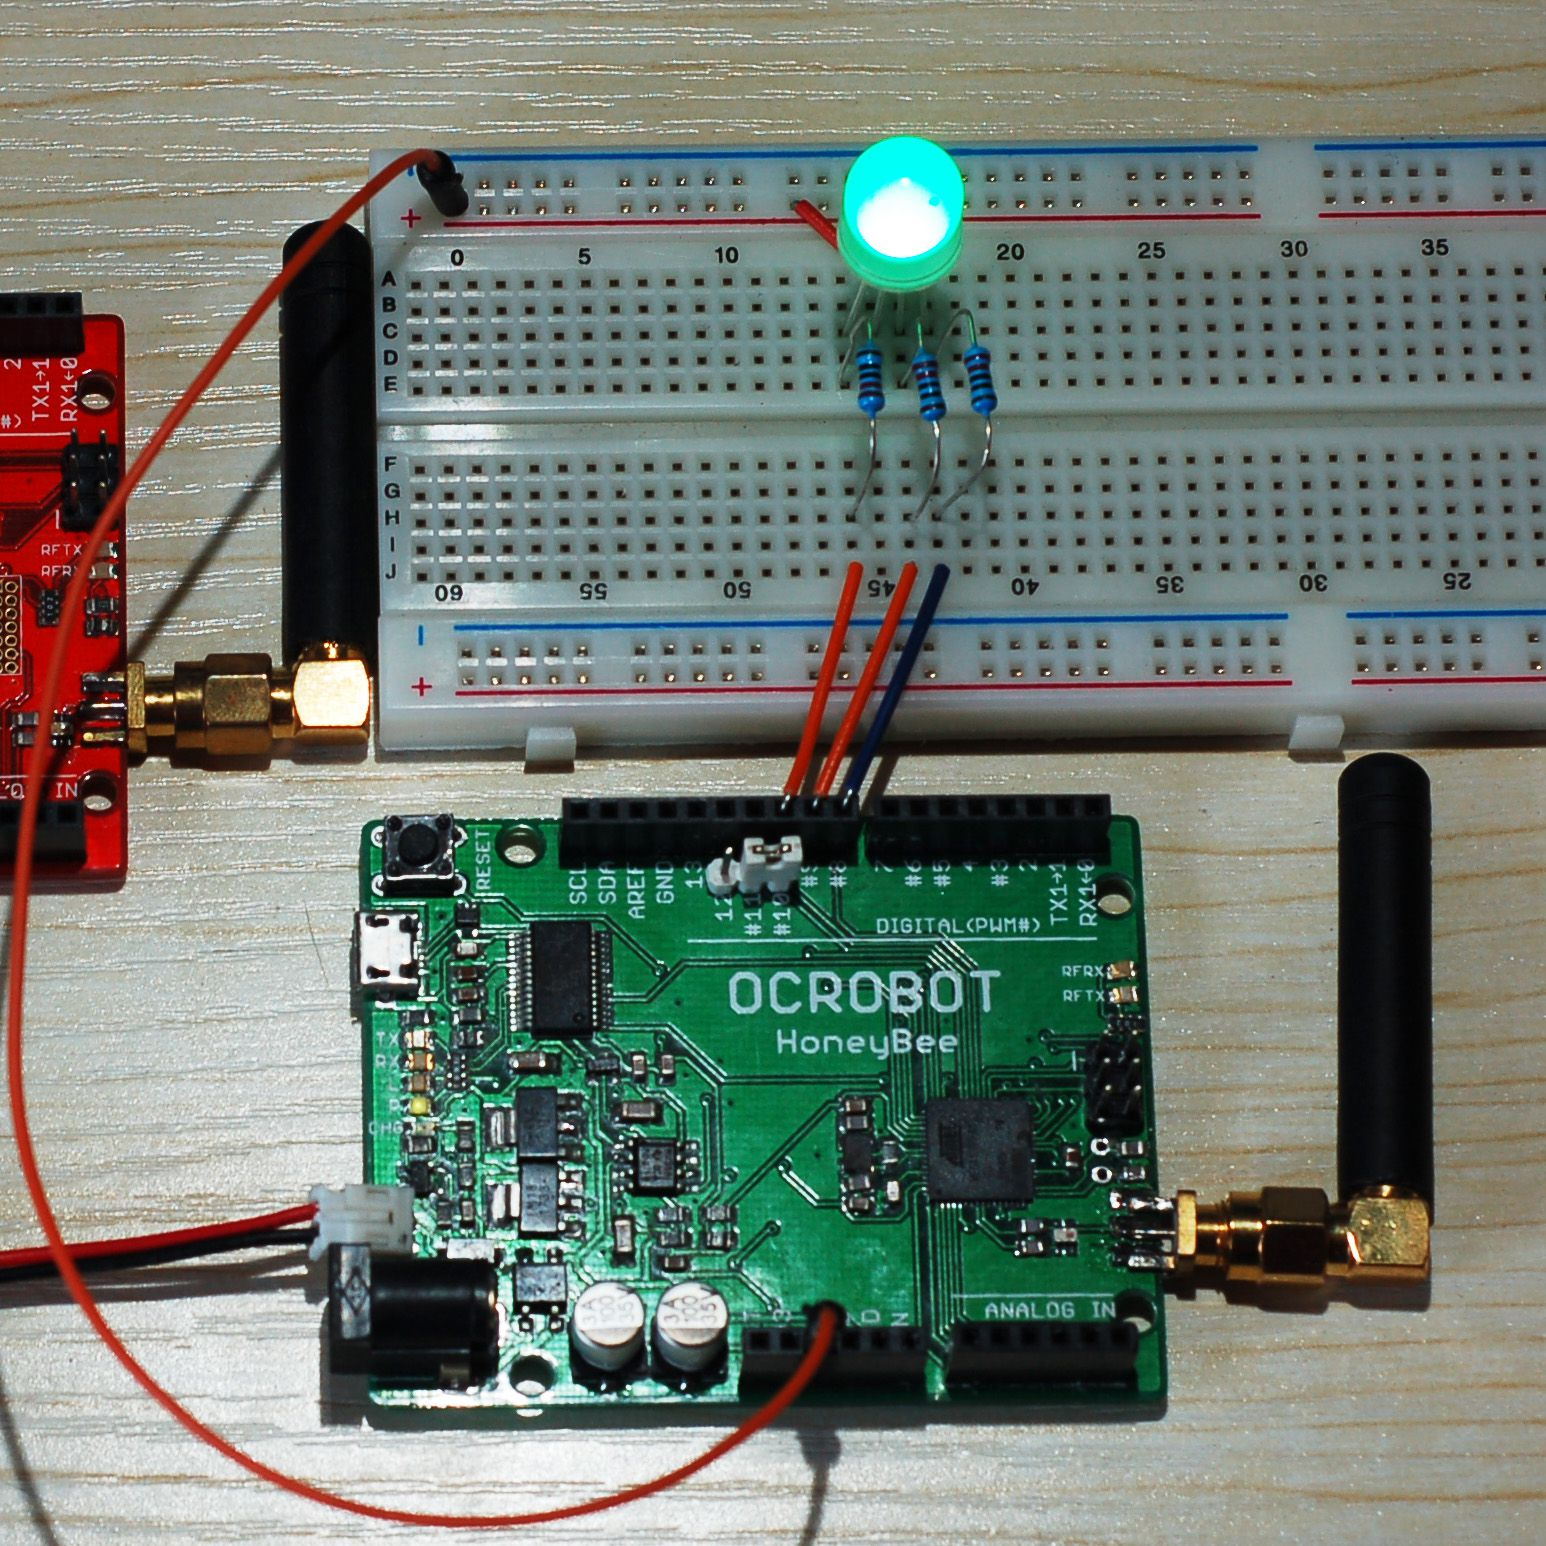 Honeybee入门教程 第四课 无线控制rgb led灯 实验一 教程 无线 powered by